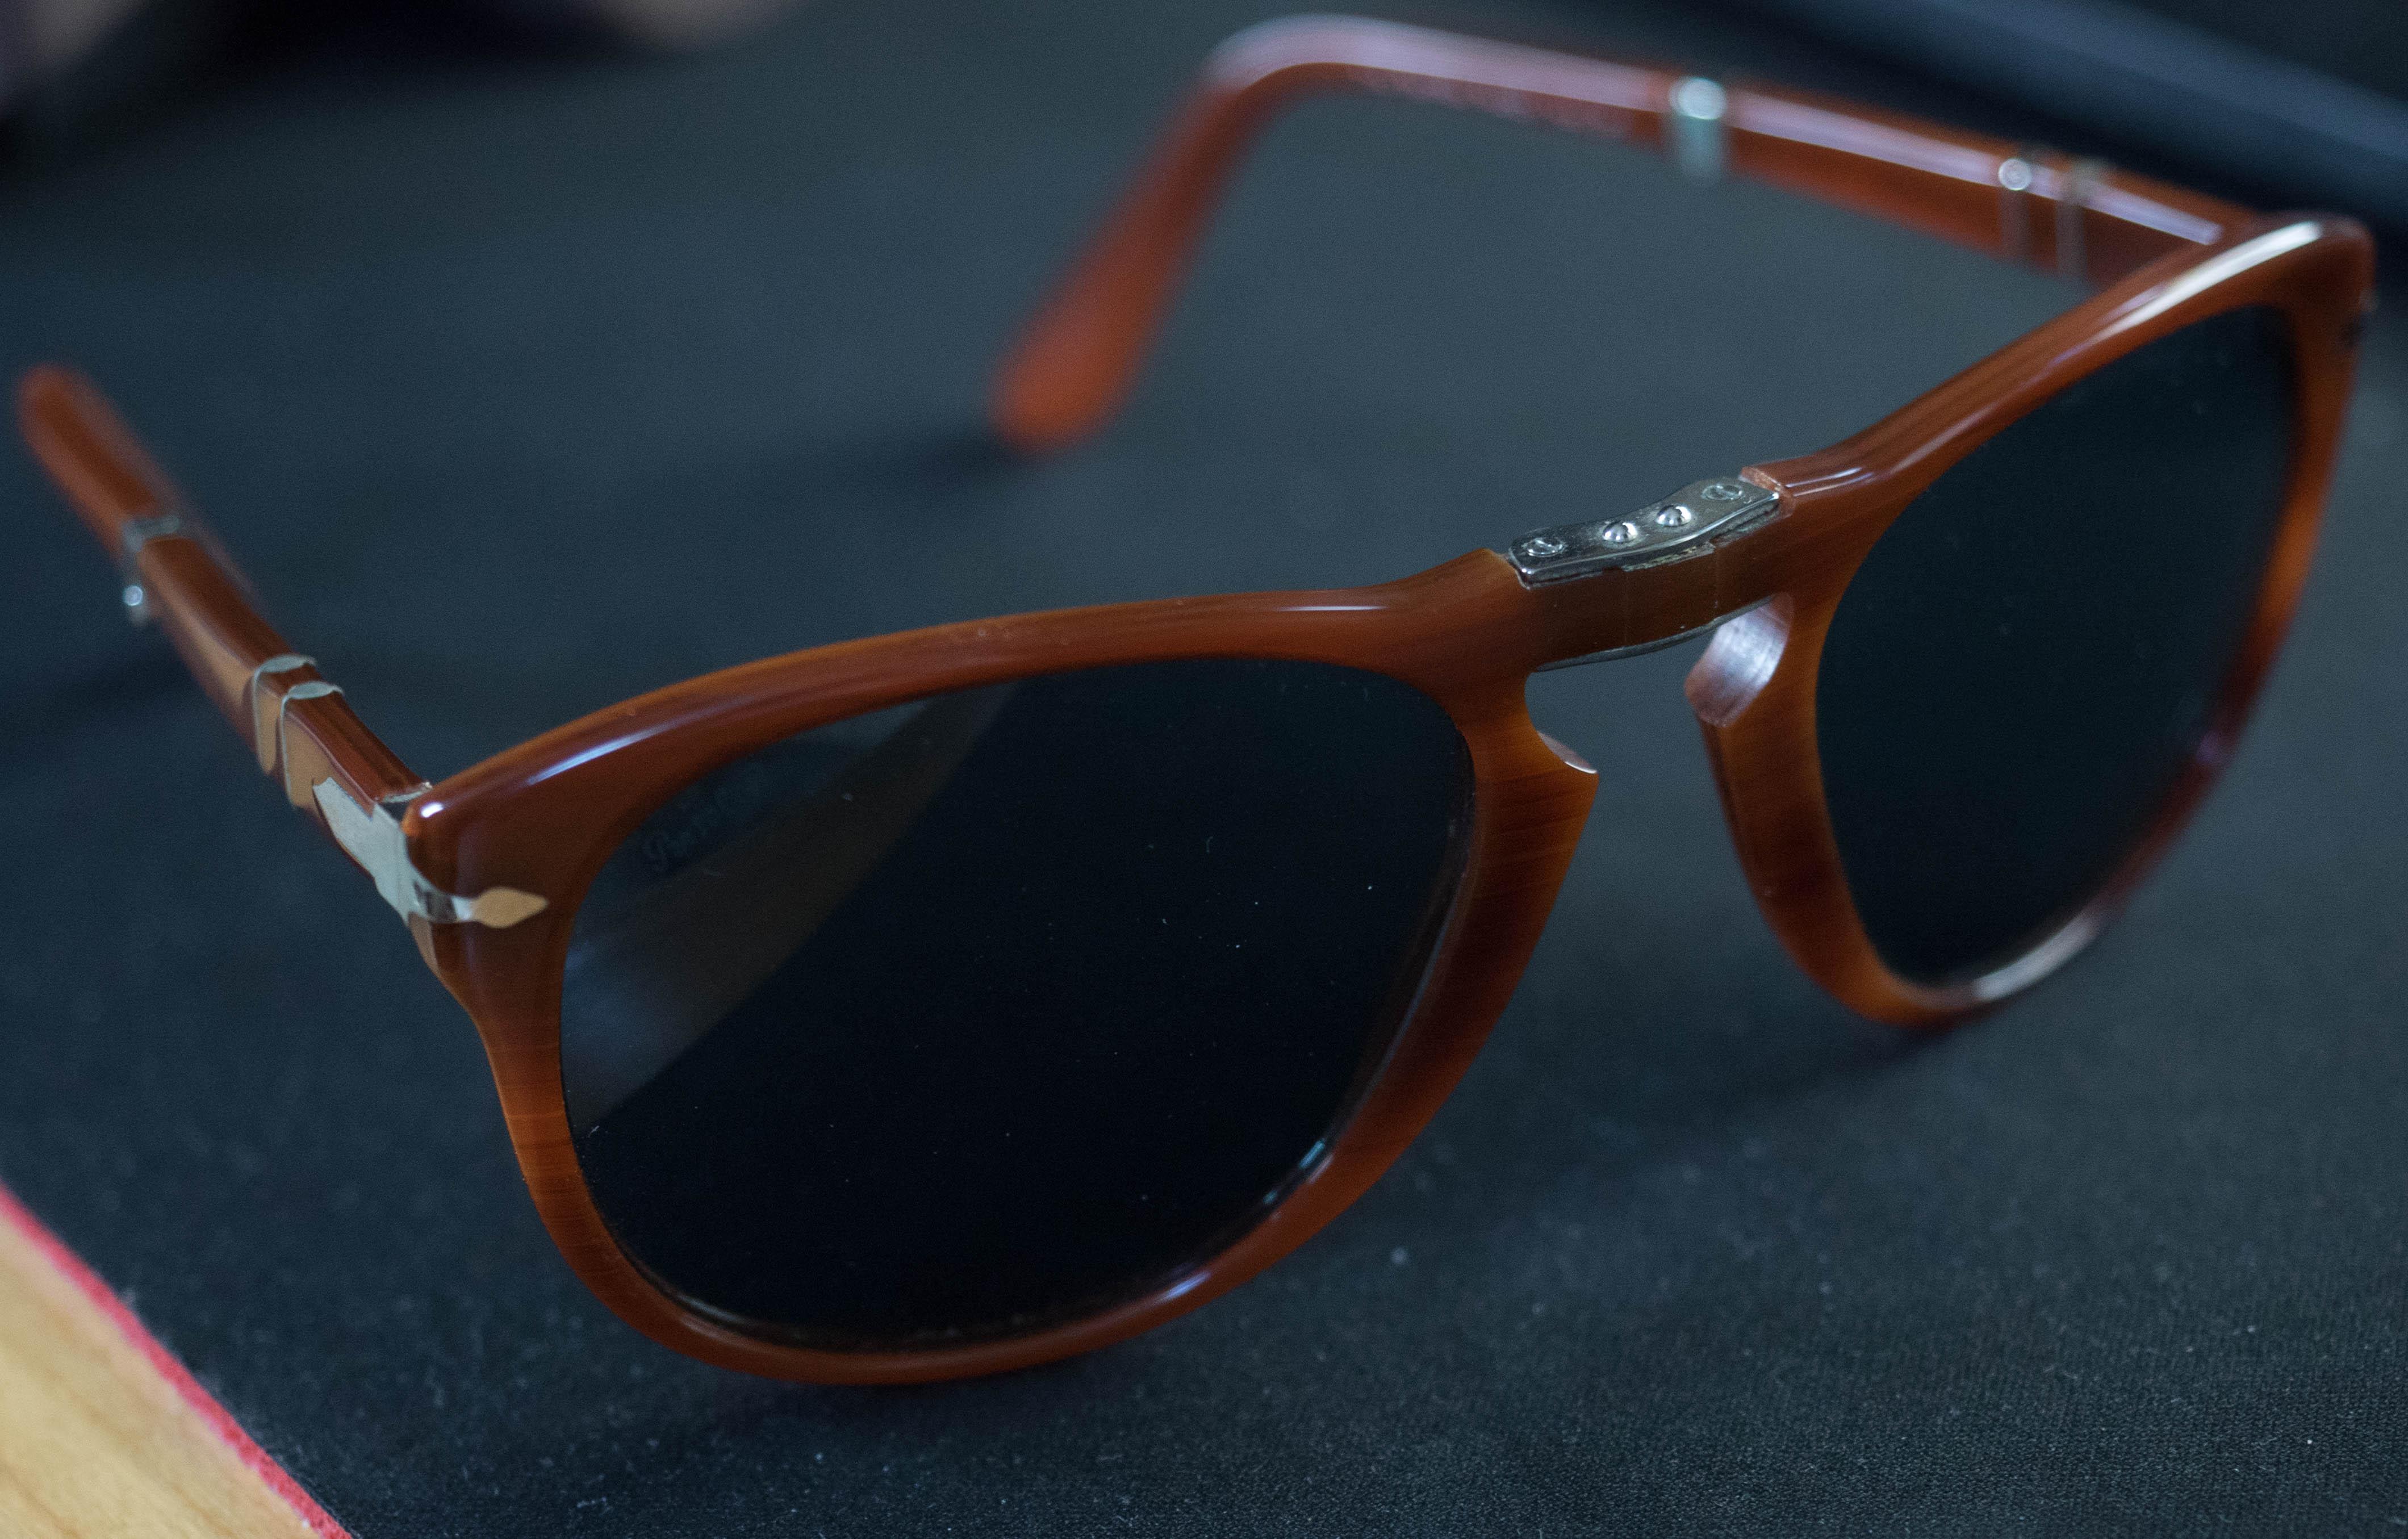 3c3b7e8eee Persol PO714 Foldable Polarised sunglasses Size one size - Sunglasses for  Sale - Grailed